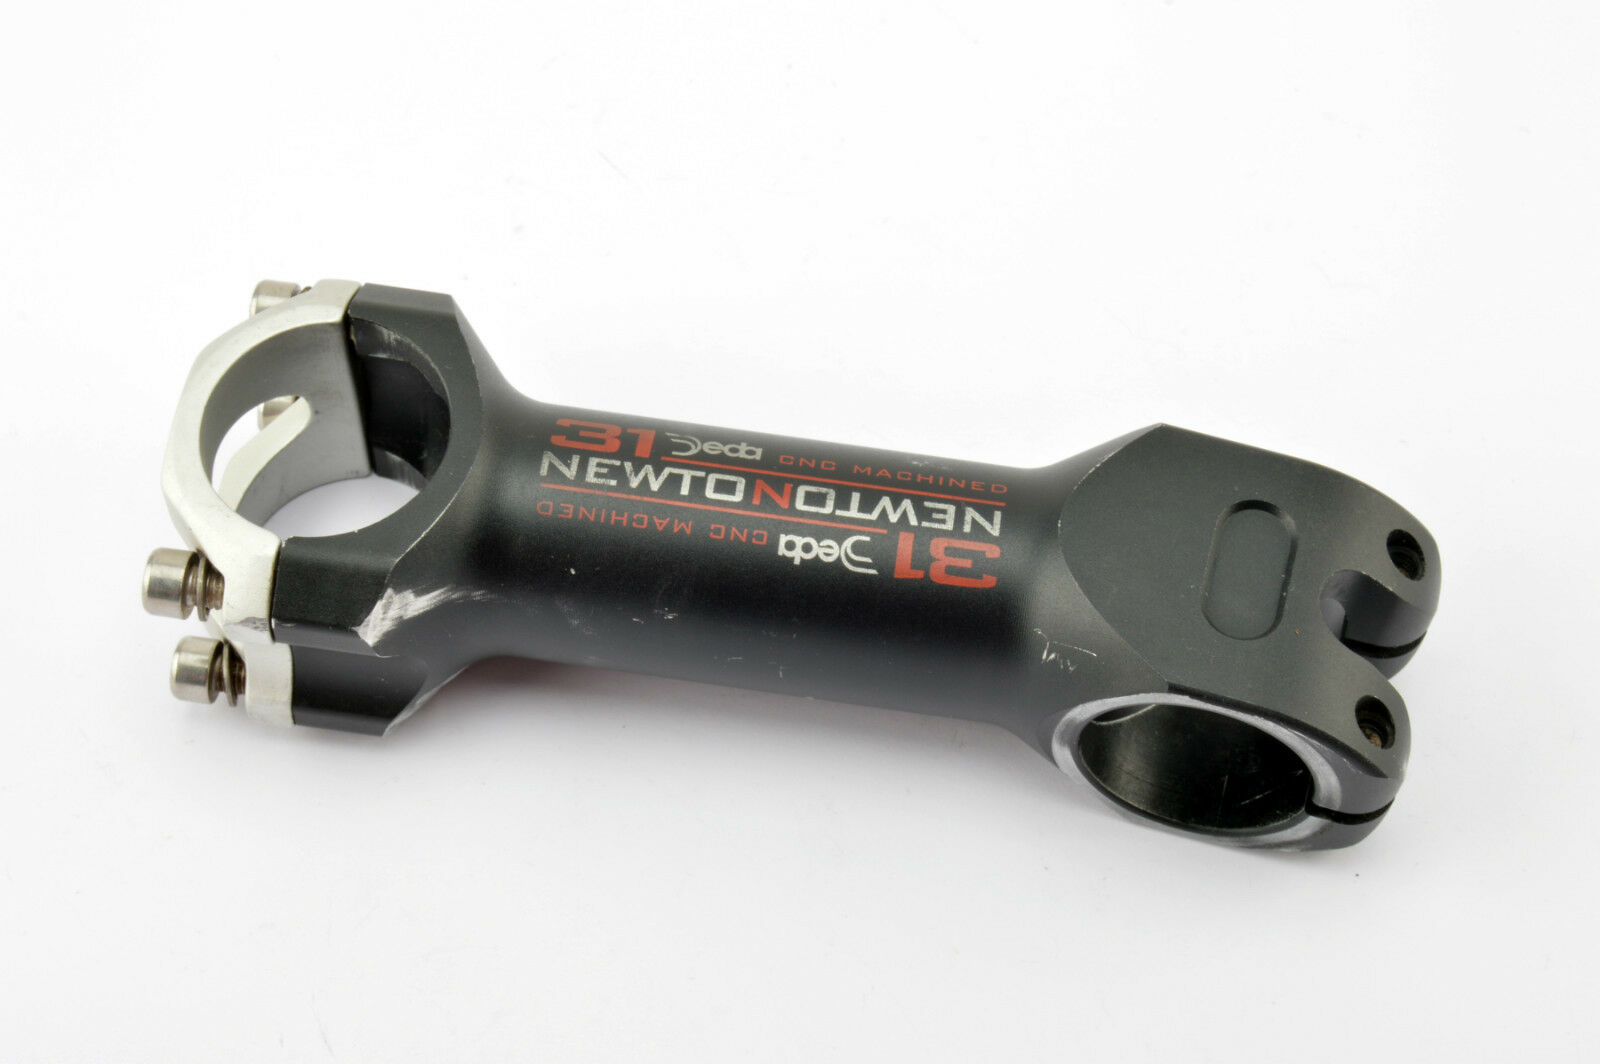 Deda 31 Newton Ahead stem in Größe 110mm with 31.7mm bar clamp Größe from the 2000    Discount